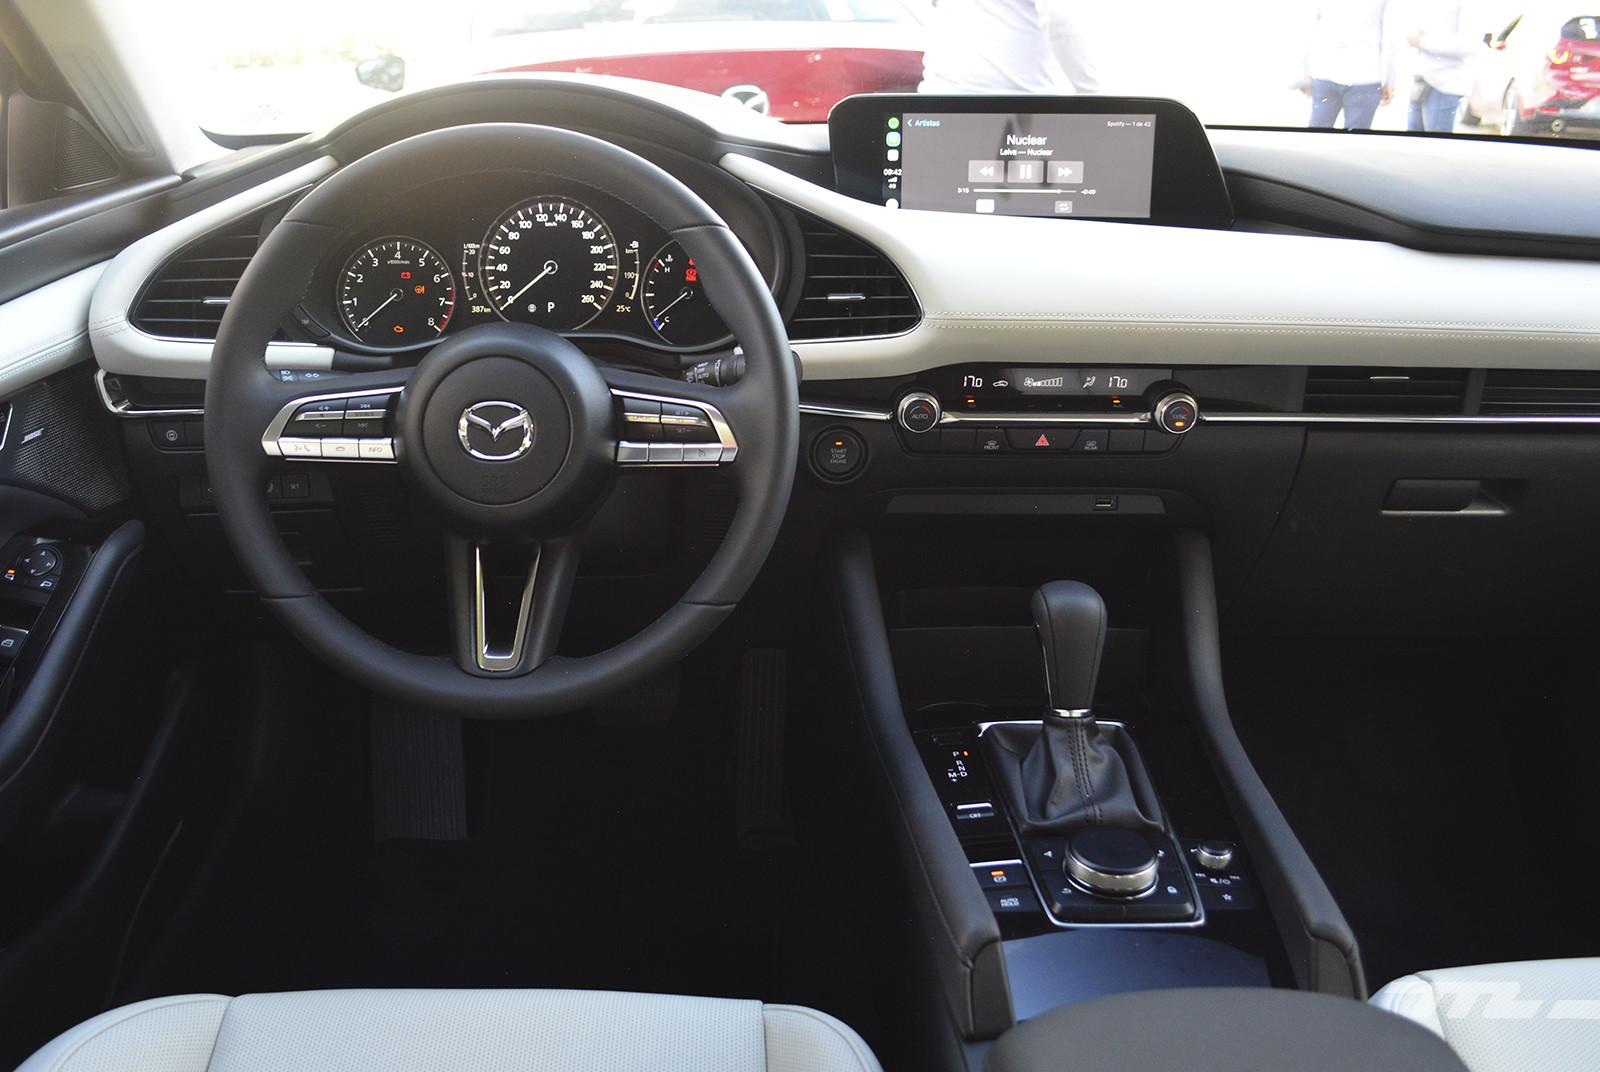 Foto de Mazda 3 vs. SEAT León (comparativa) (16/28)